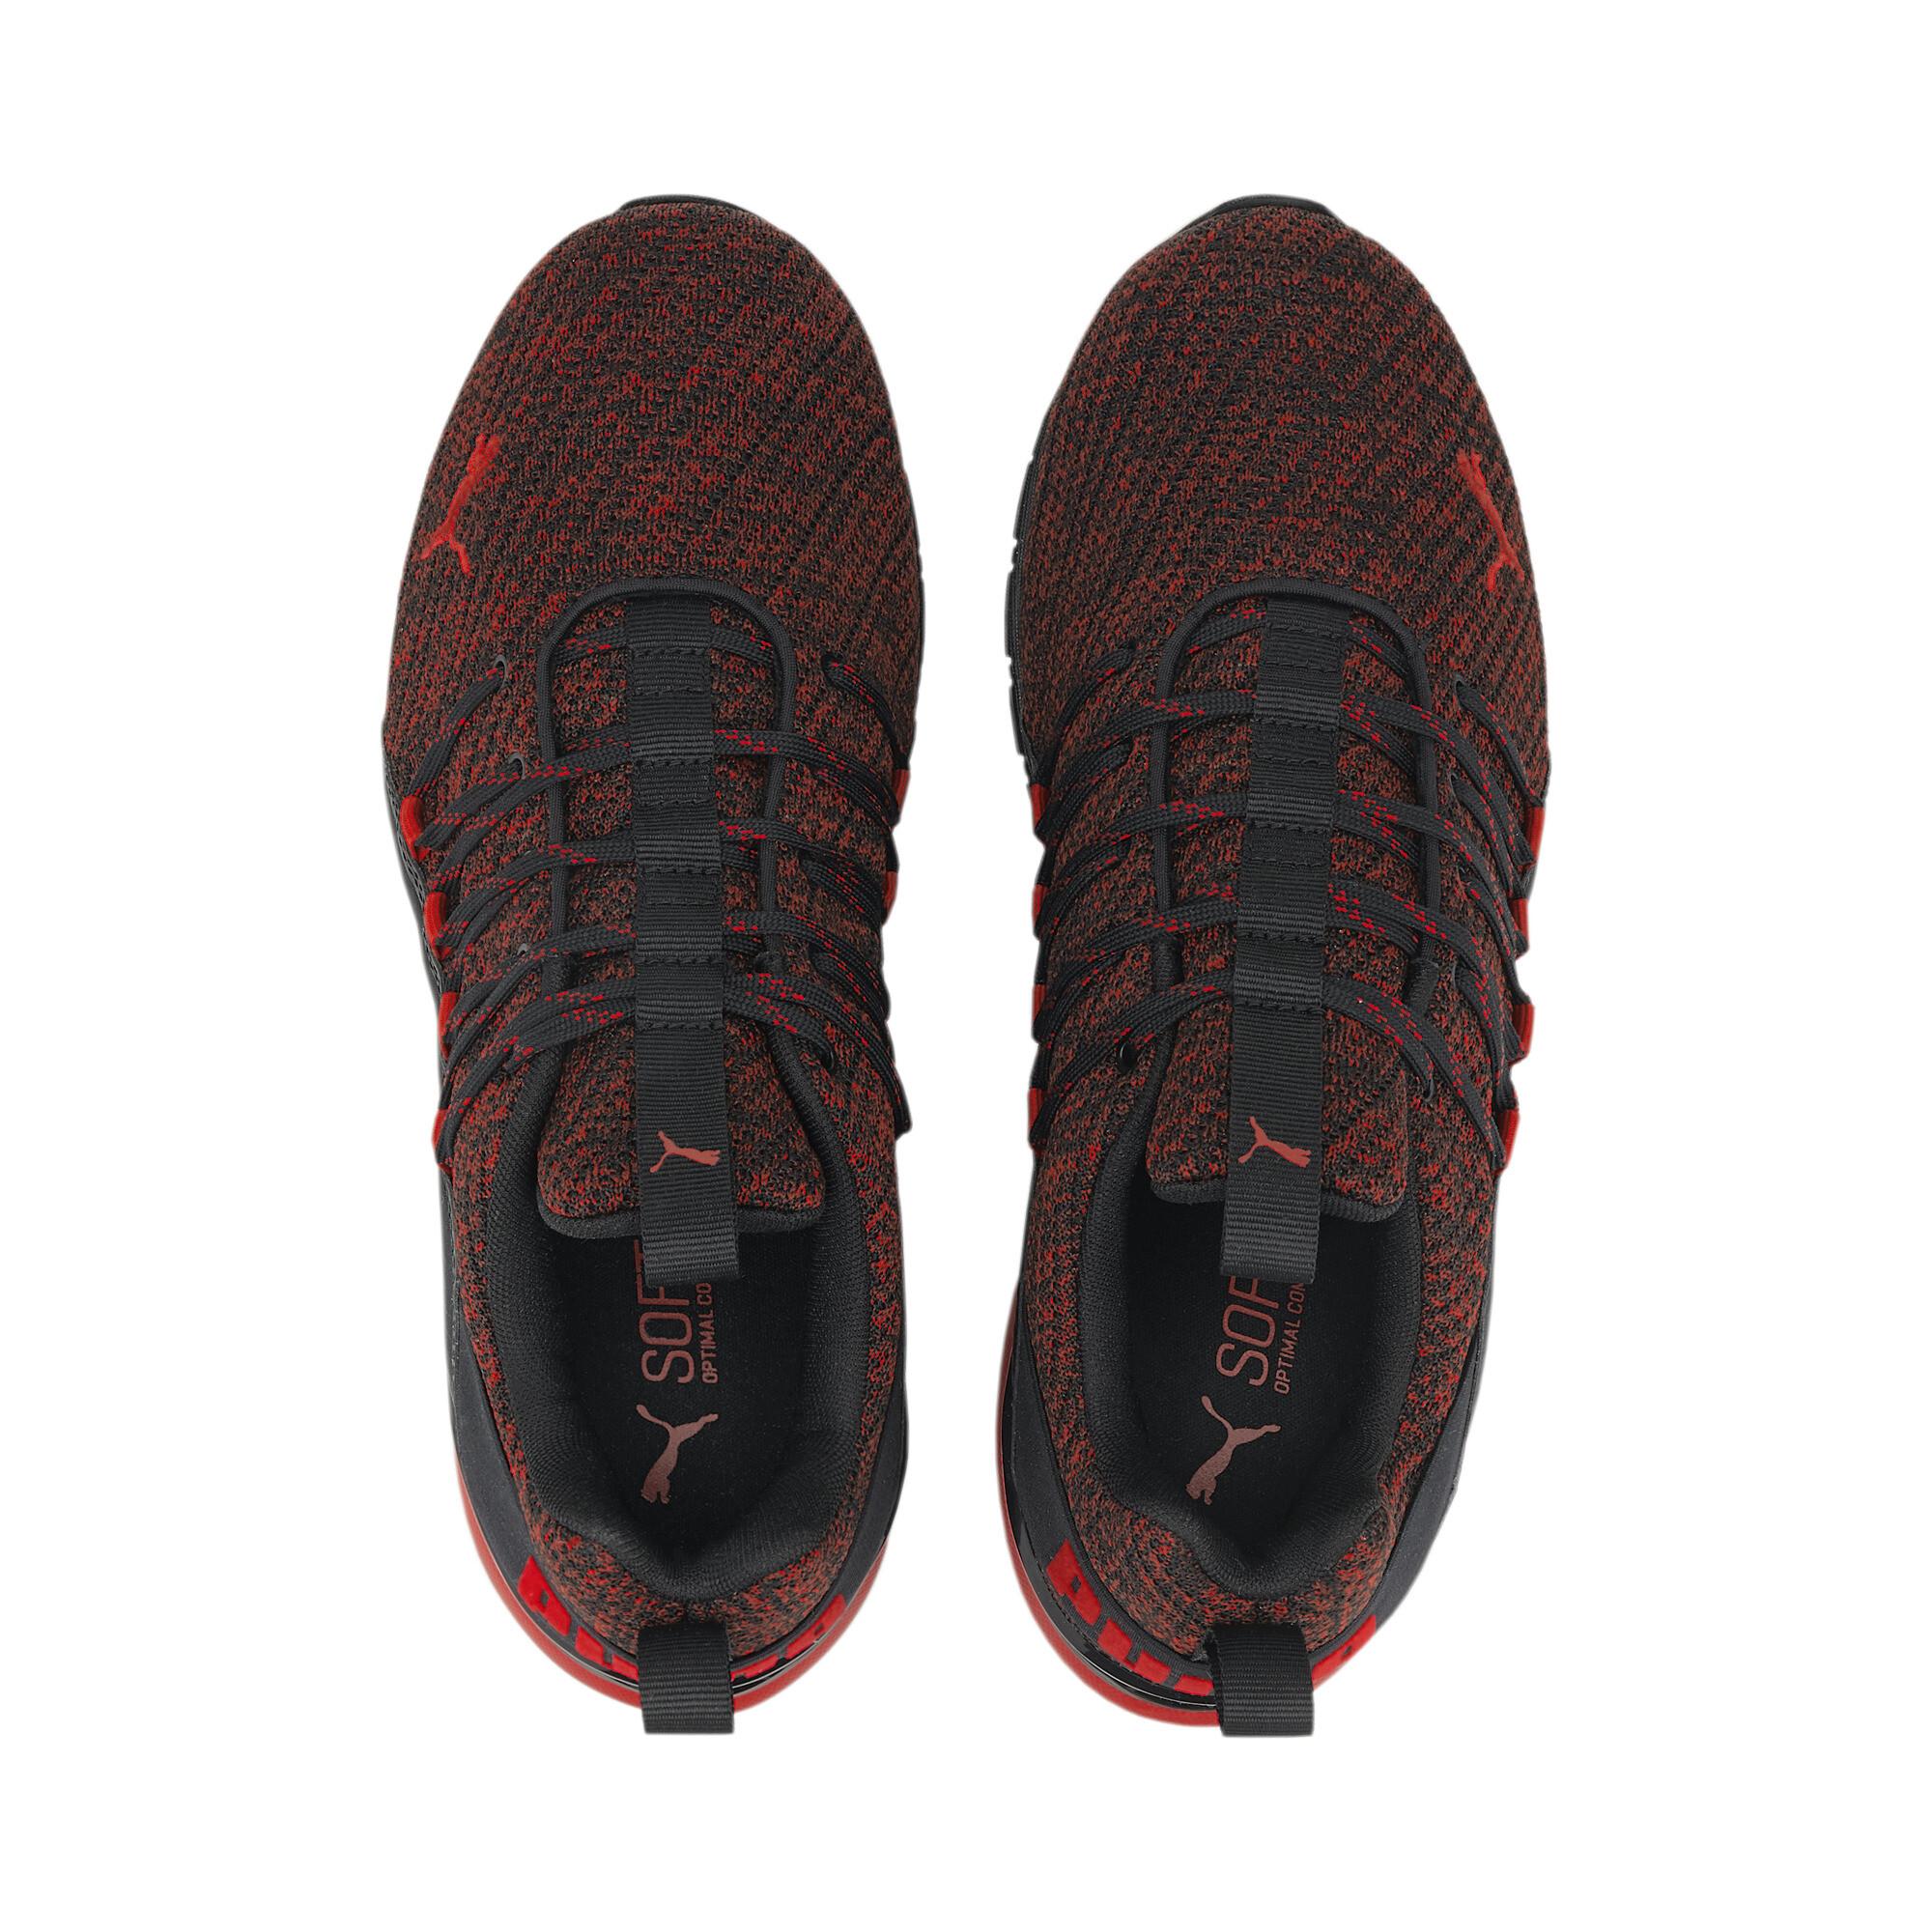 PUMA-Men-039-s-Axelion-Ultra-Running-Shoes thumbnail 8